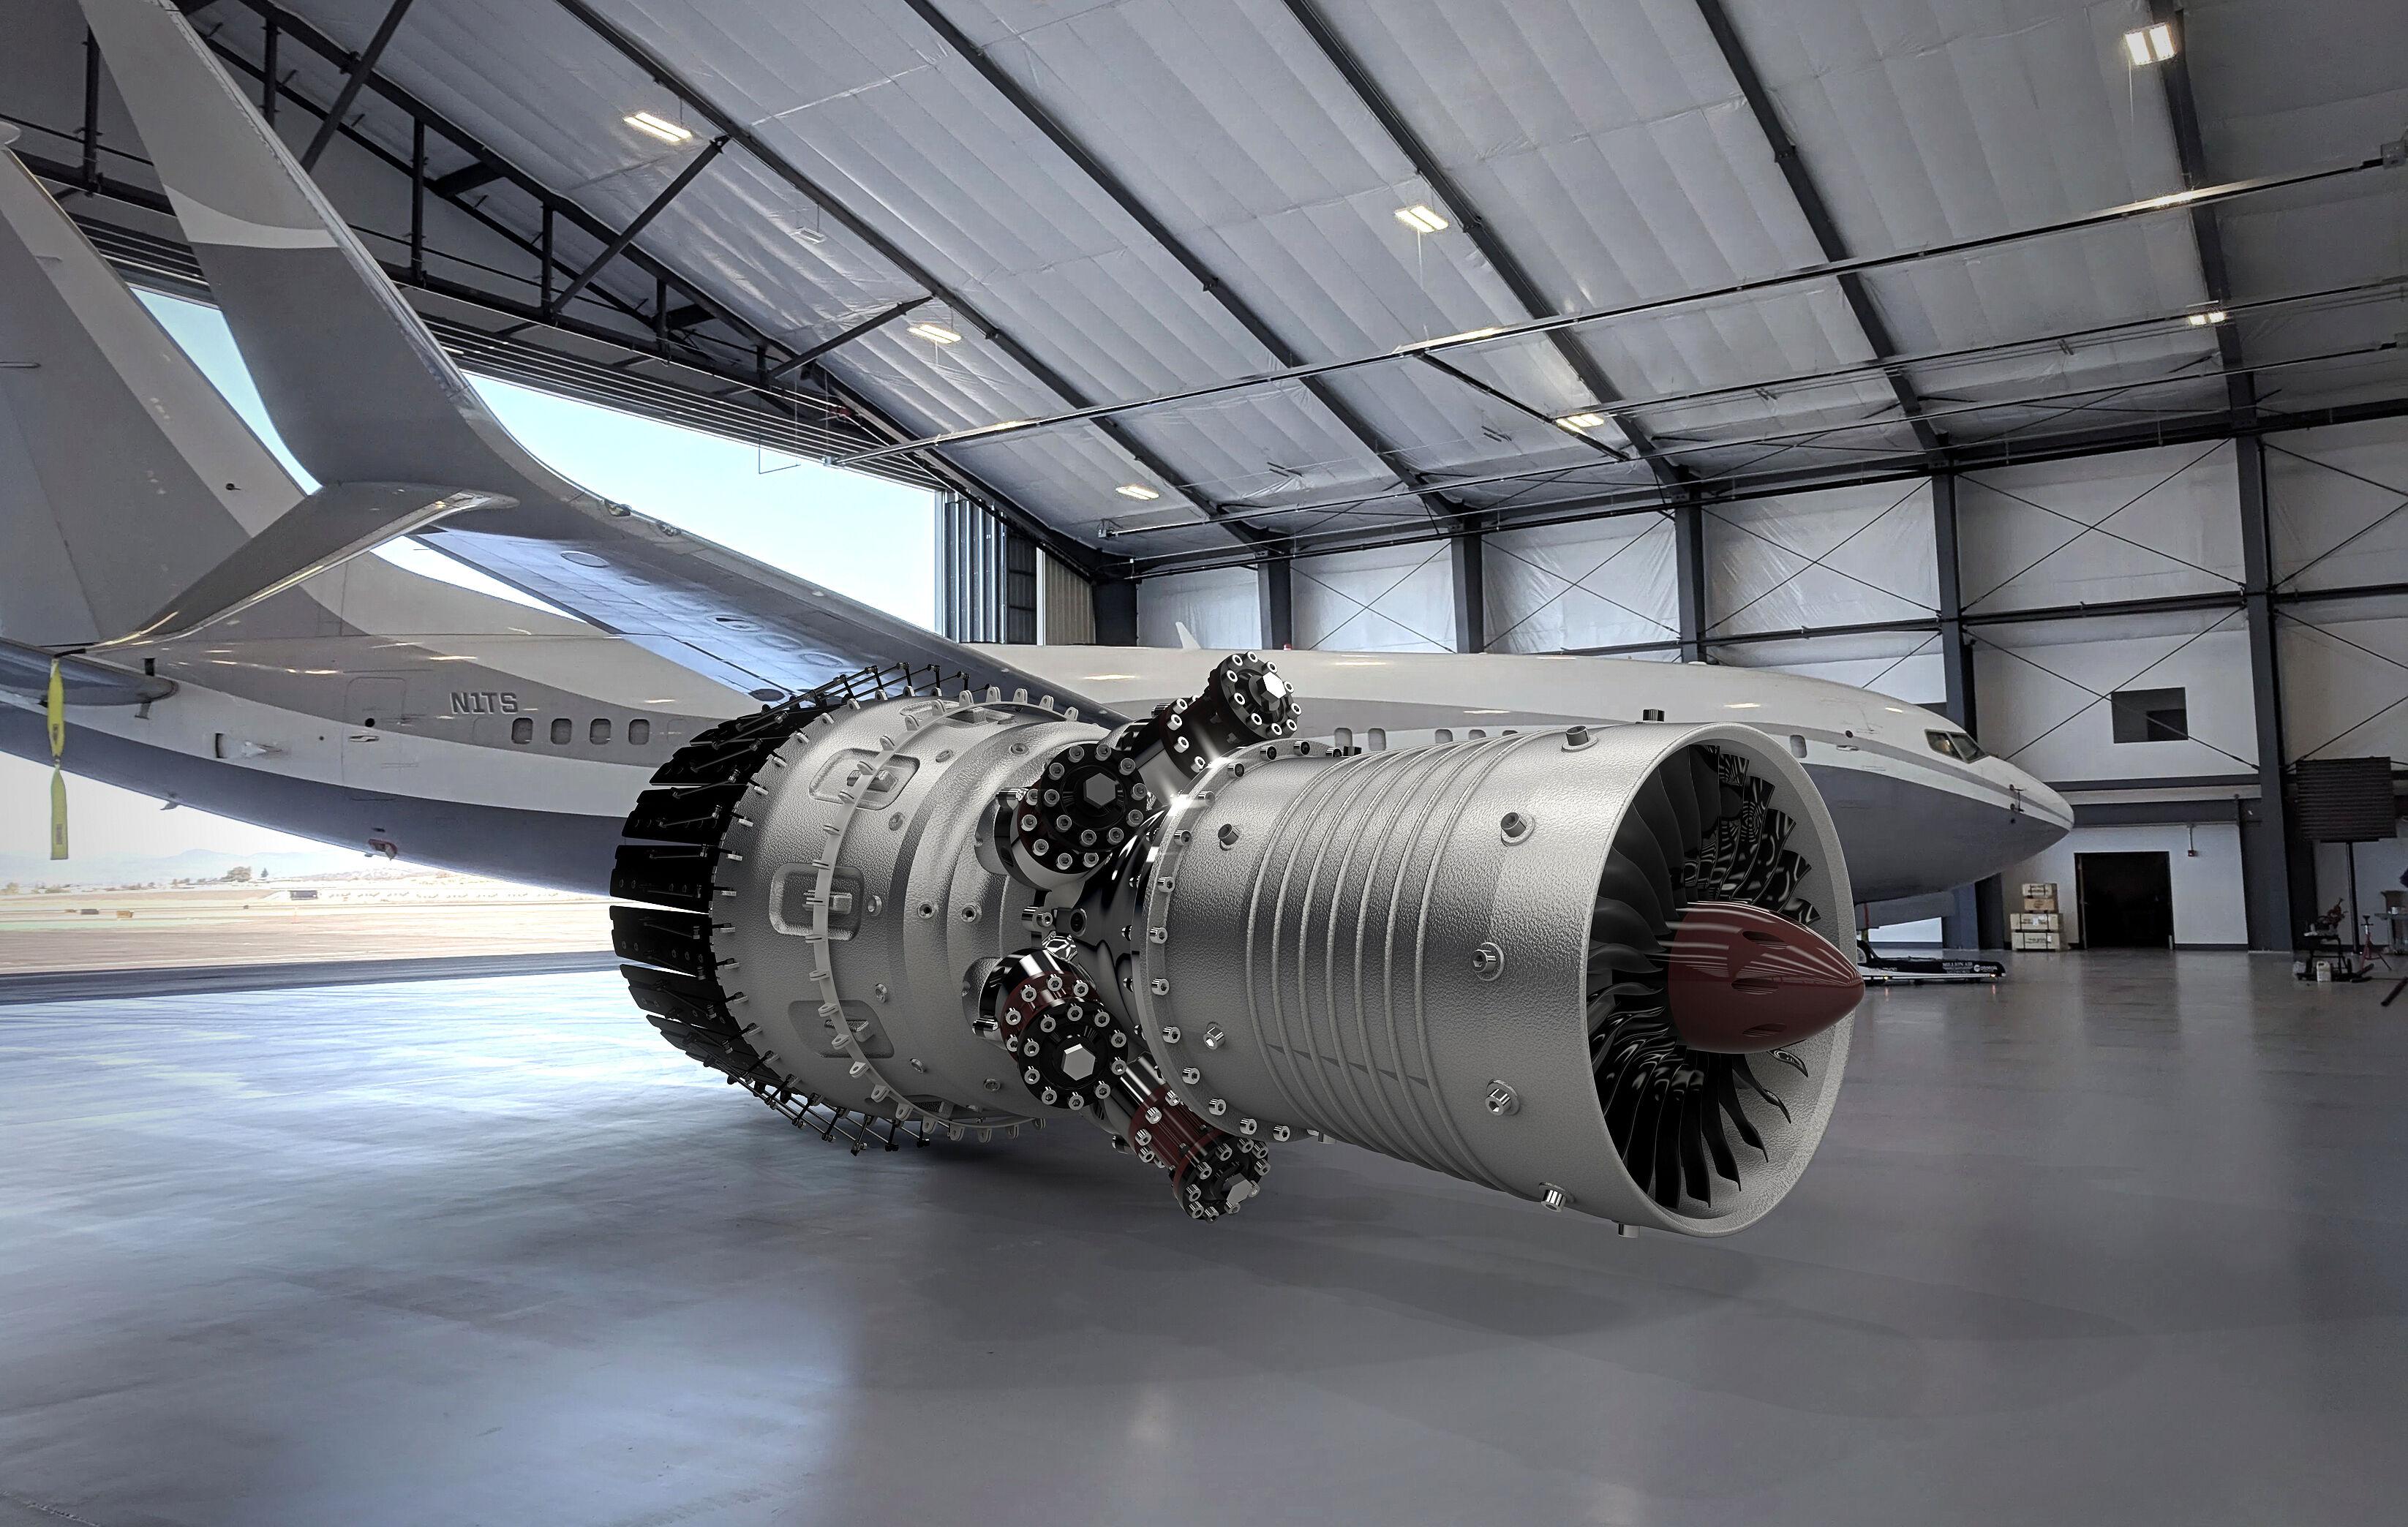 Jet-engine-model8a-3500-3500